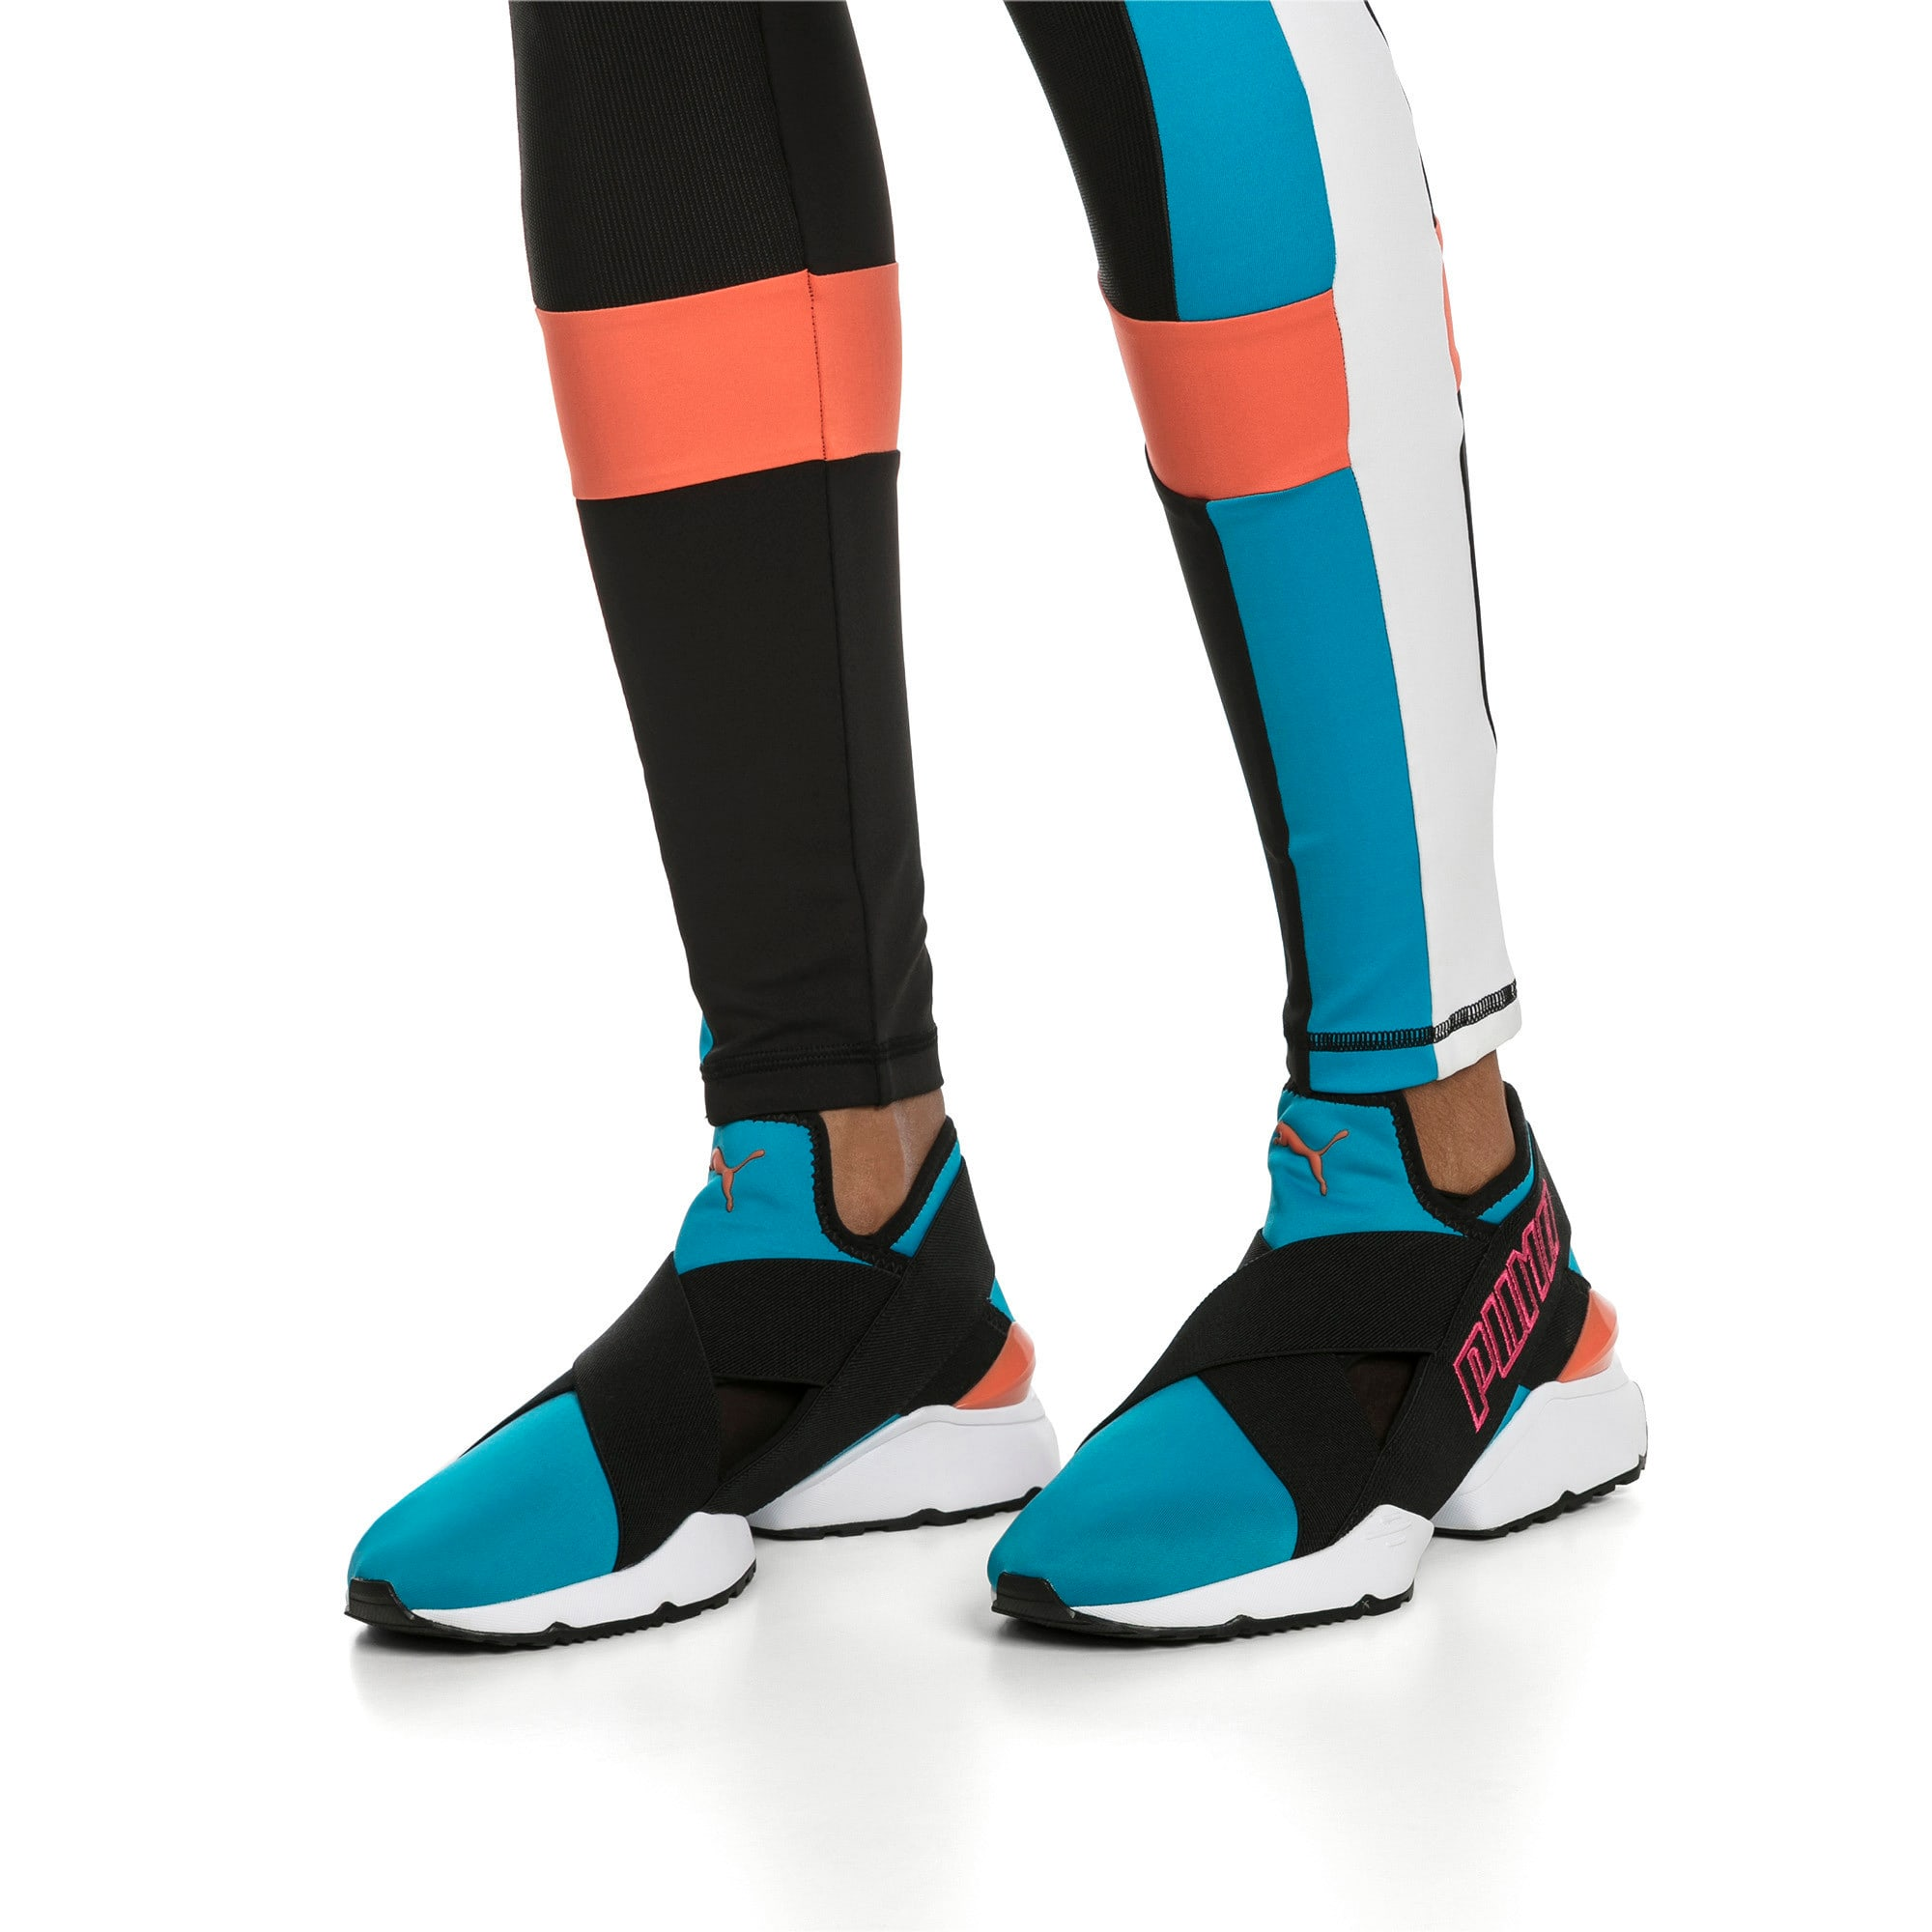 Thumbnail 2 of Muse 2 EOS Trailblazer Women's Sneakers, Caribbean Sea-Puma Black, medium